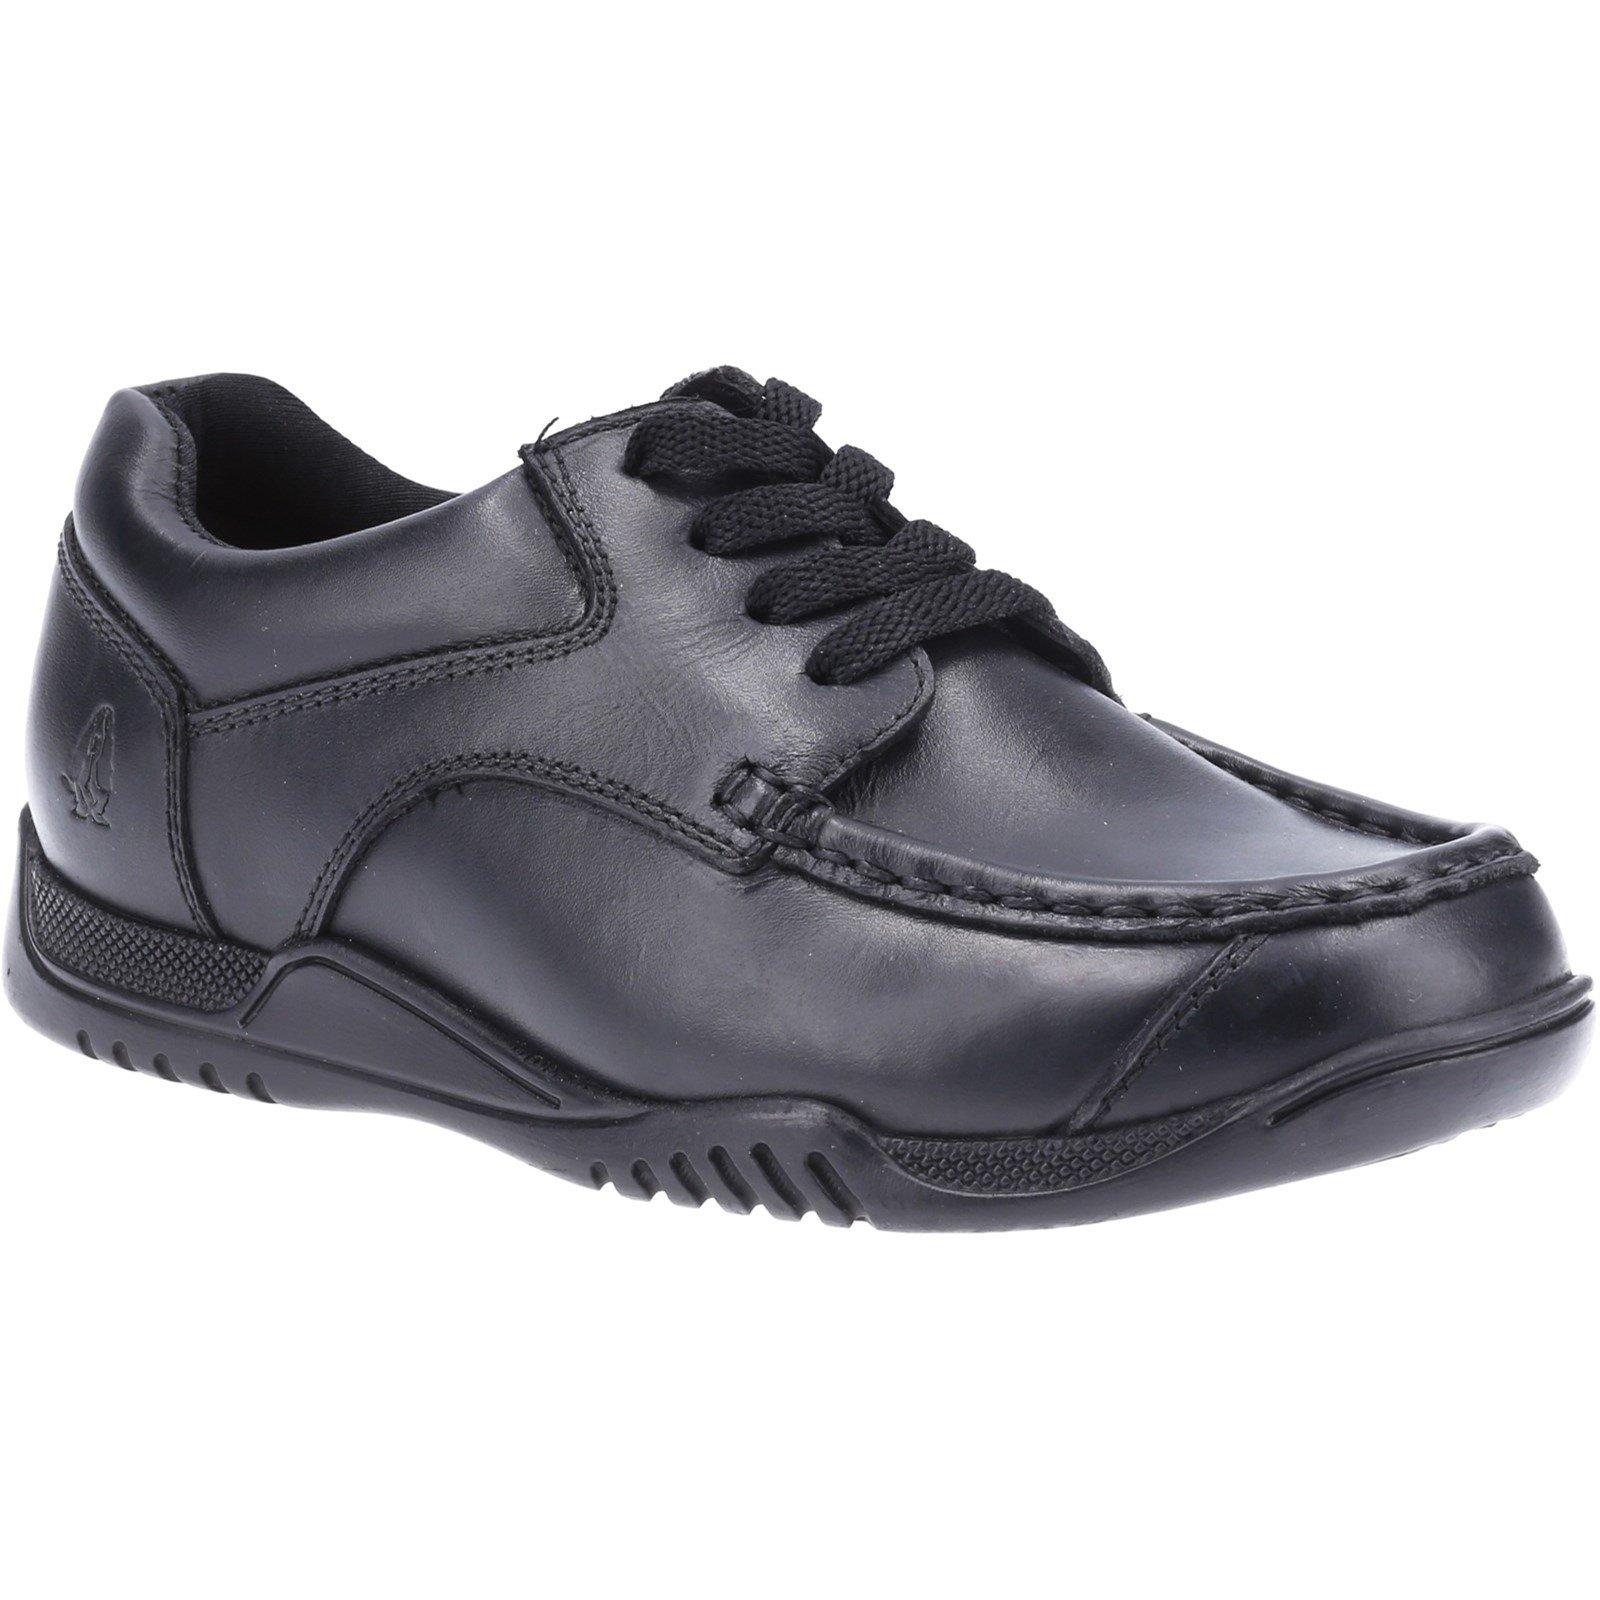 Hush Puppies Kid's Hudson Junior School Shoe Black 32582 - Black 1